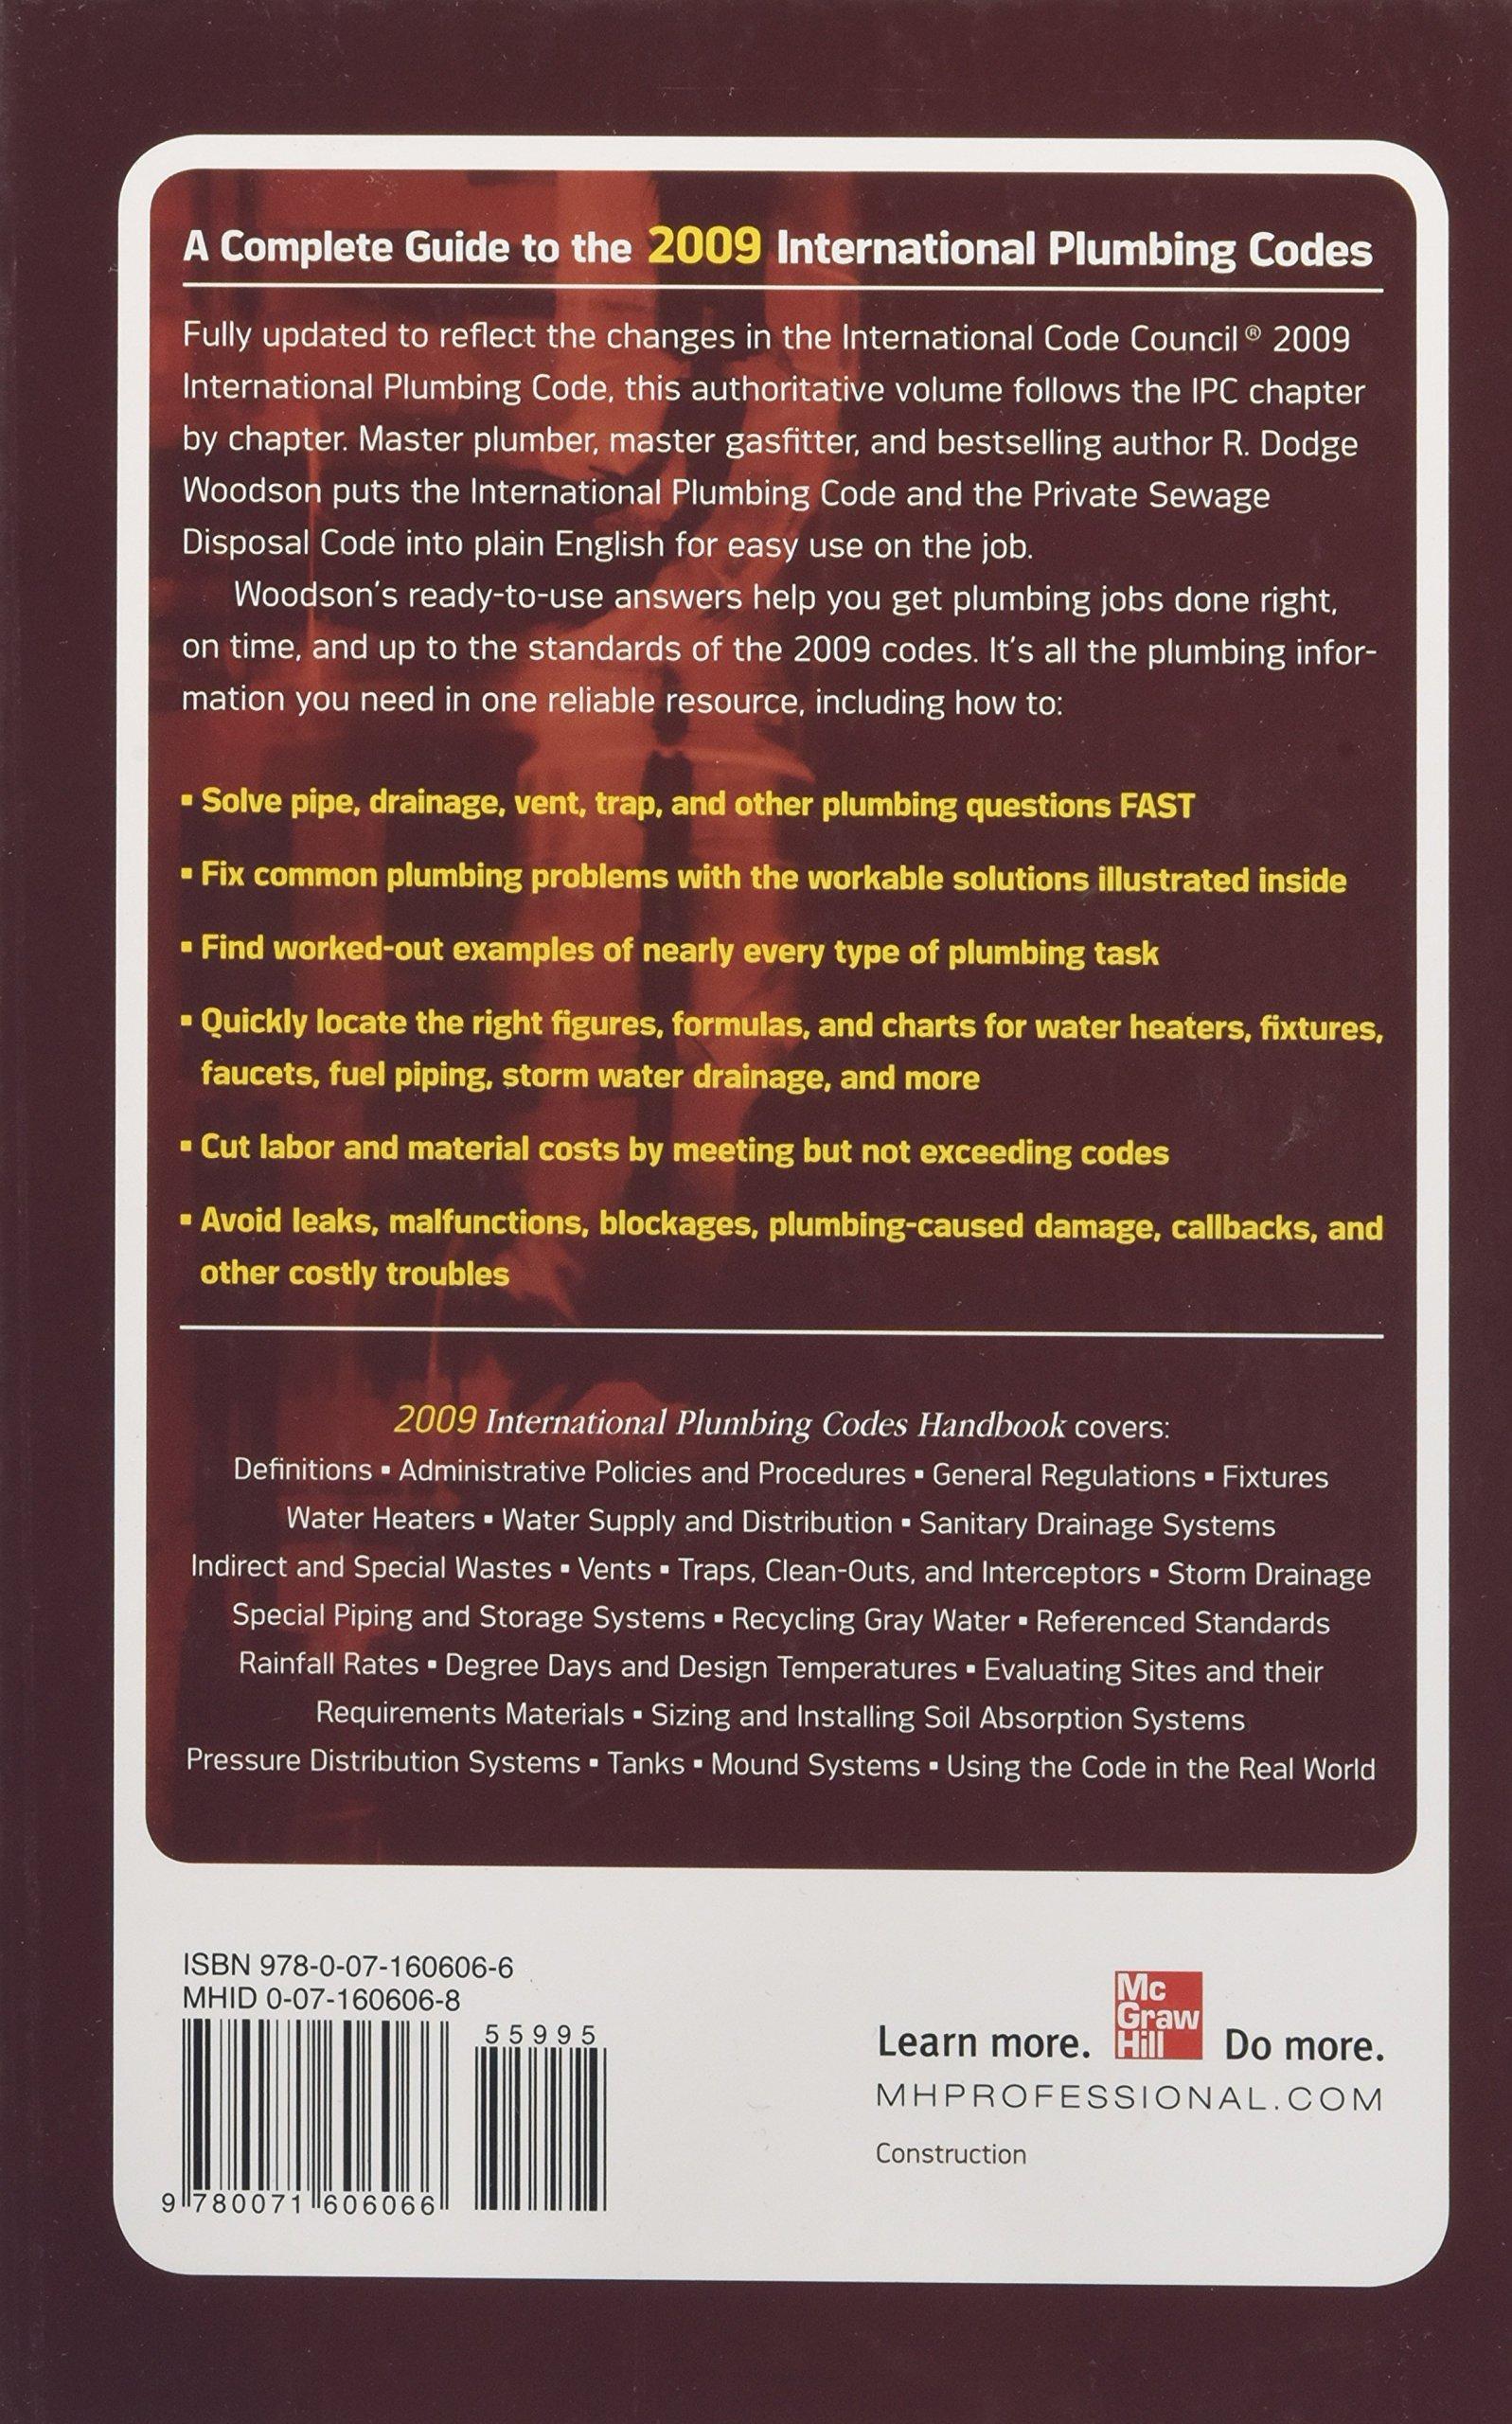 Plumbing labor cost guide array 2009 international plumbing codes handbook r dodge woodson rh fandeluxe Choice Image